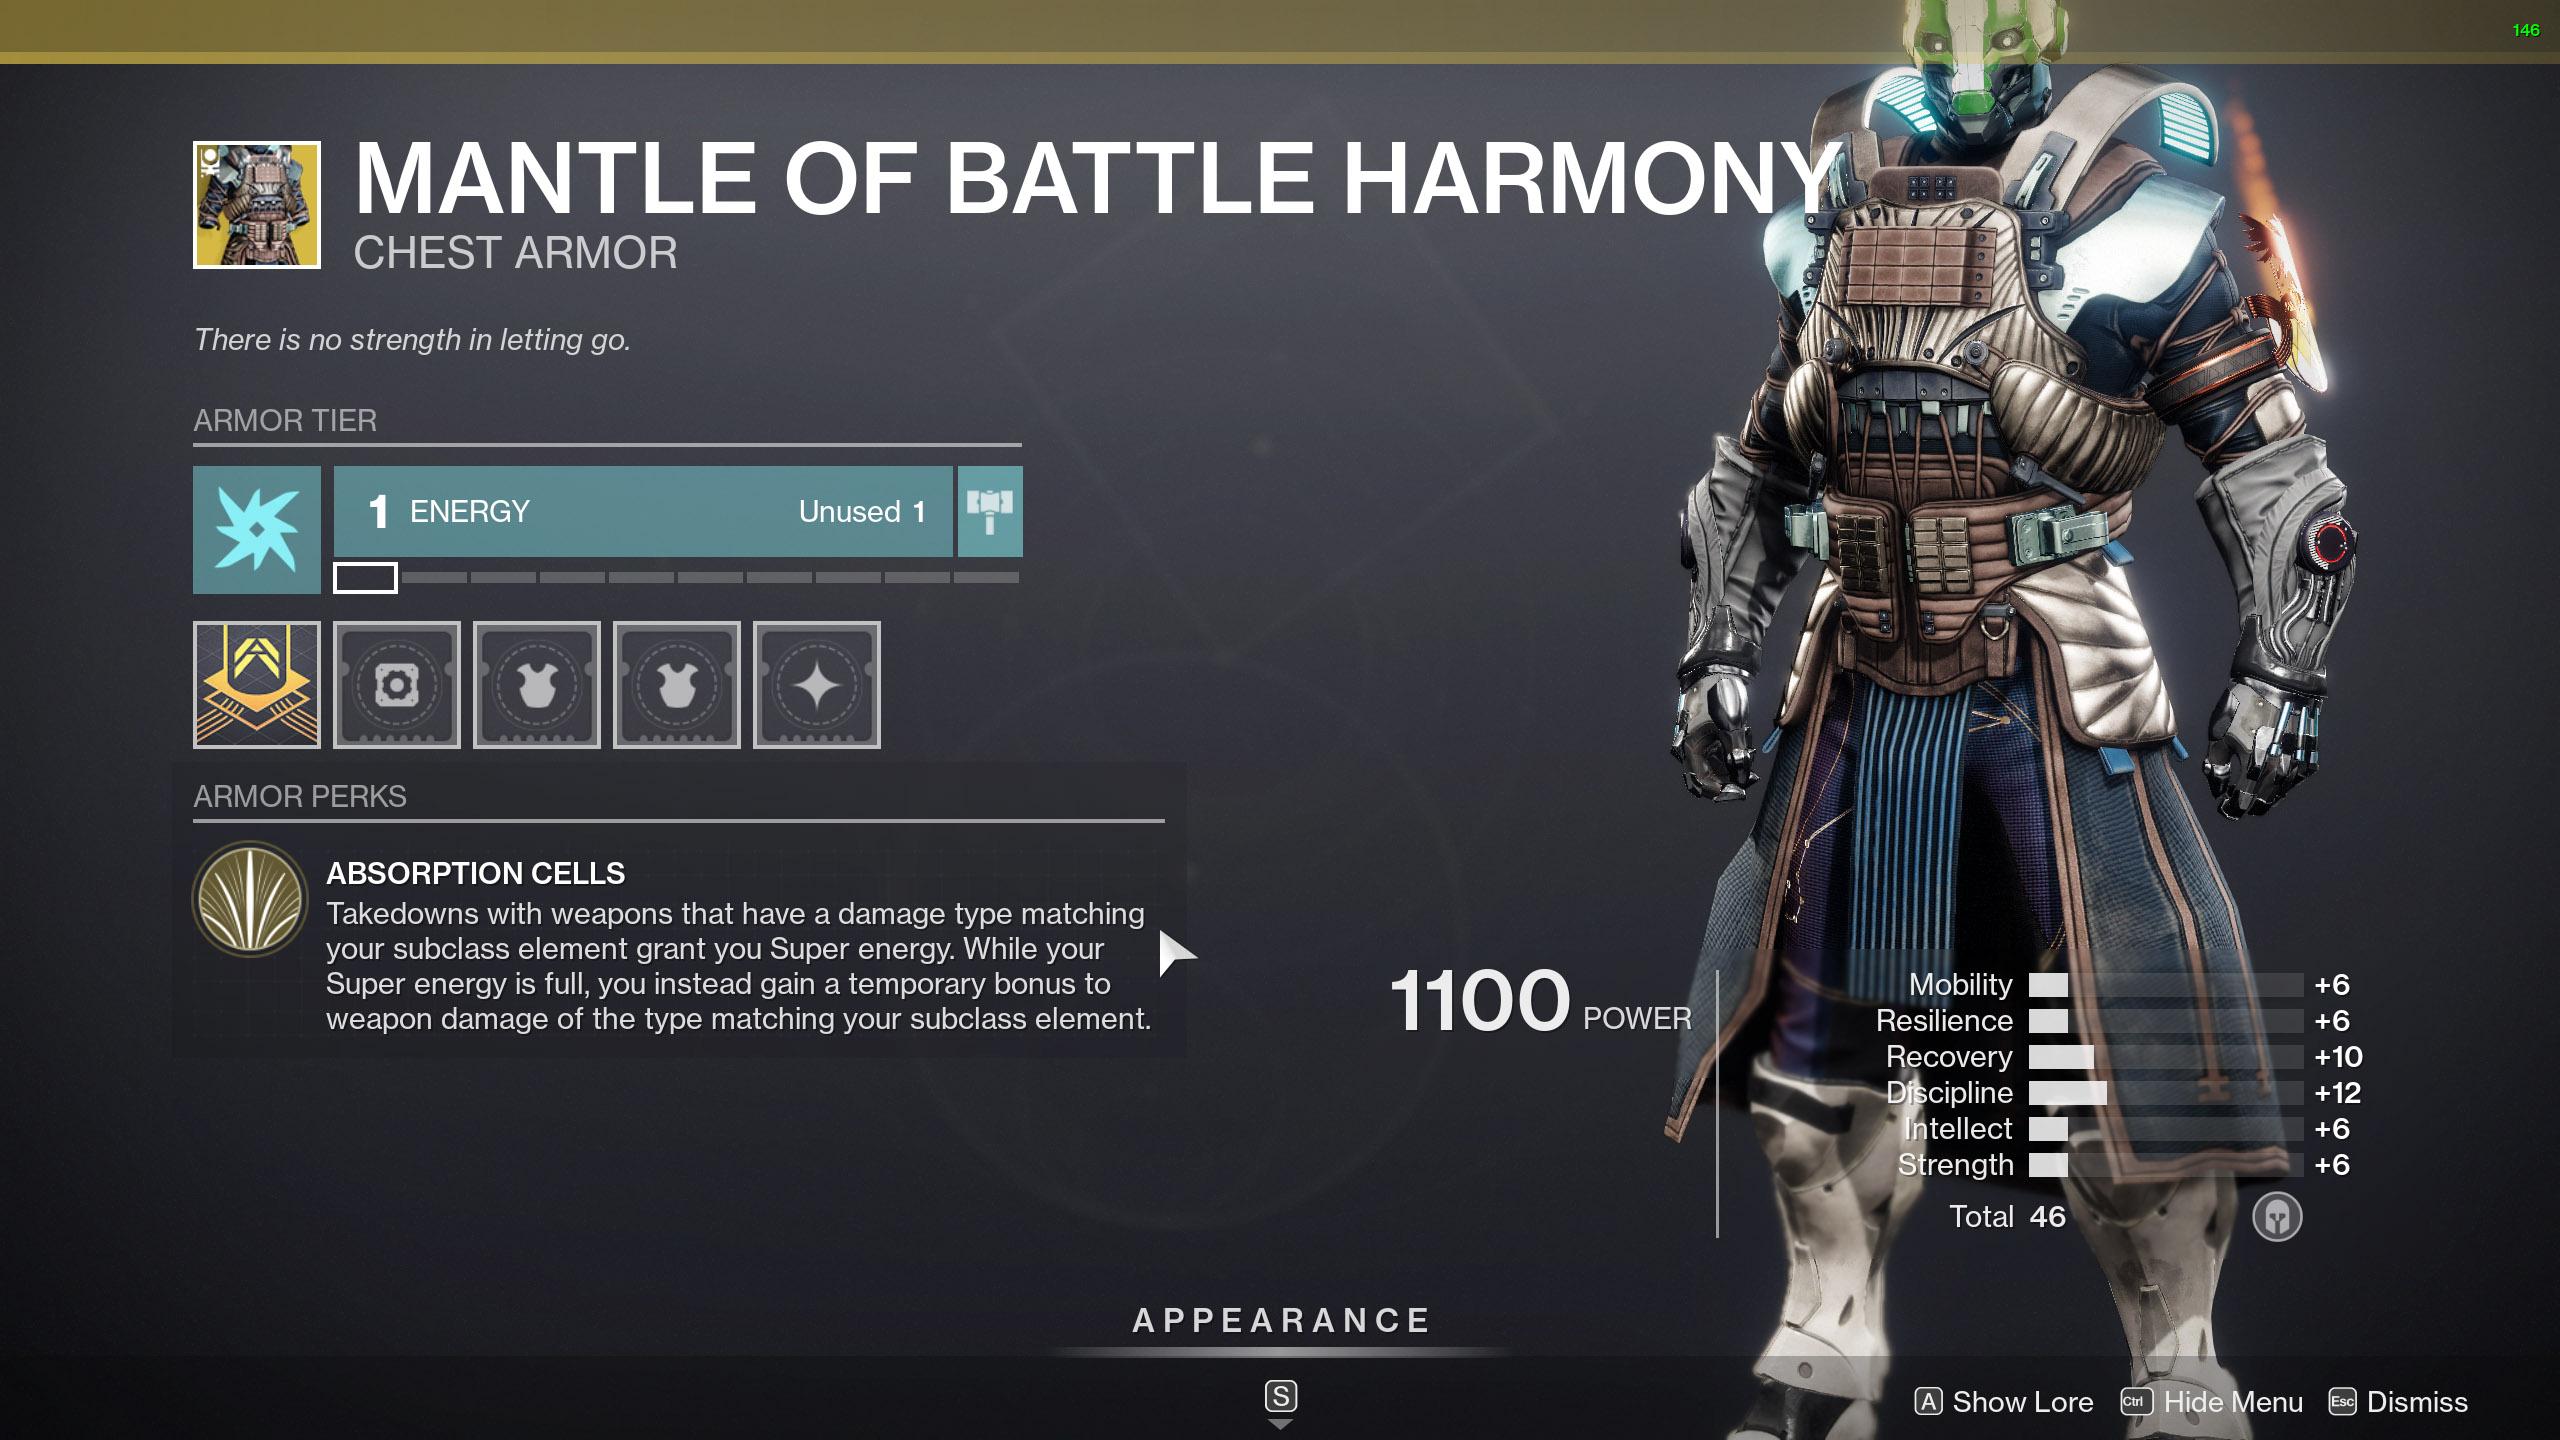 destiny 2 exotic warlock armor mantle of battle harmony